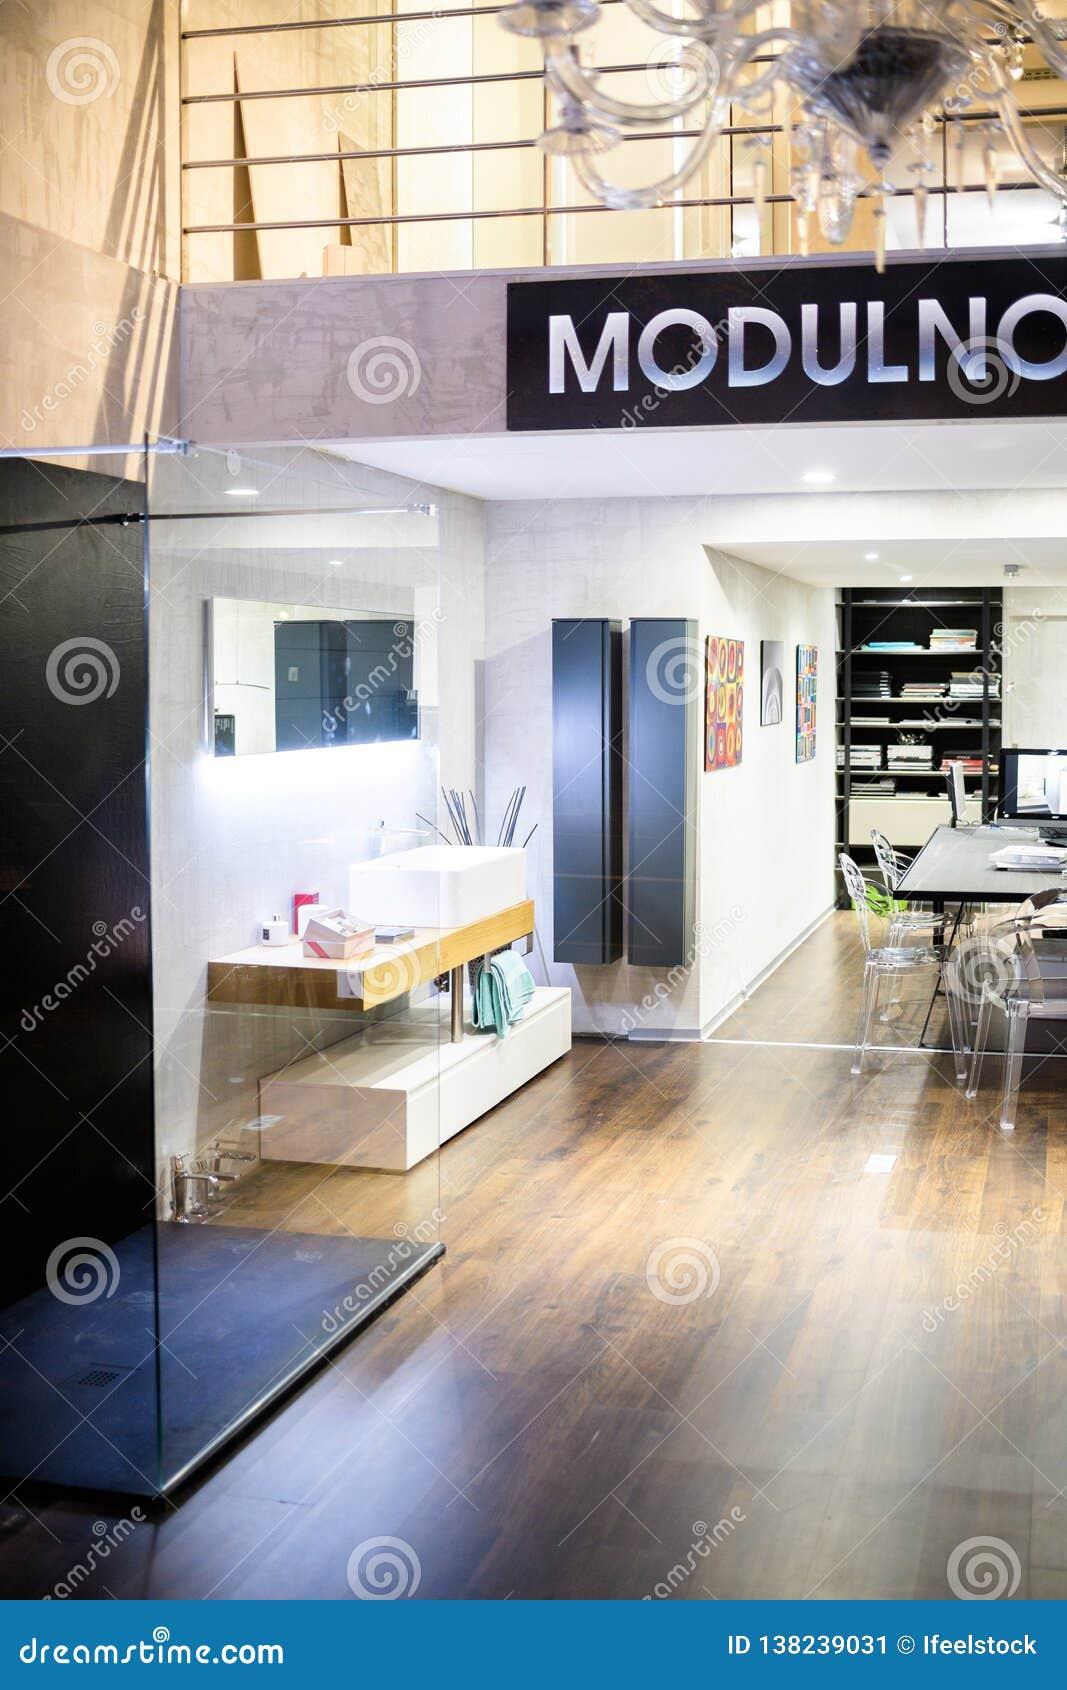 Luxury interior designer showroom view from the street